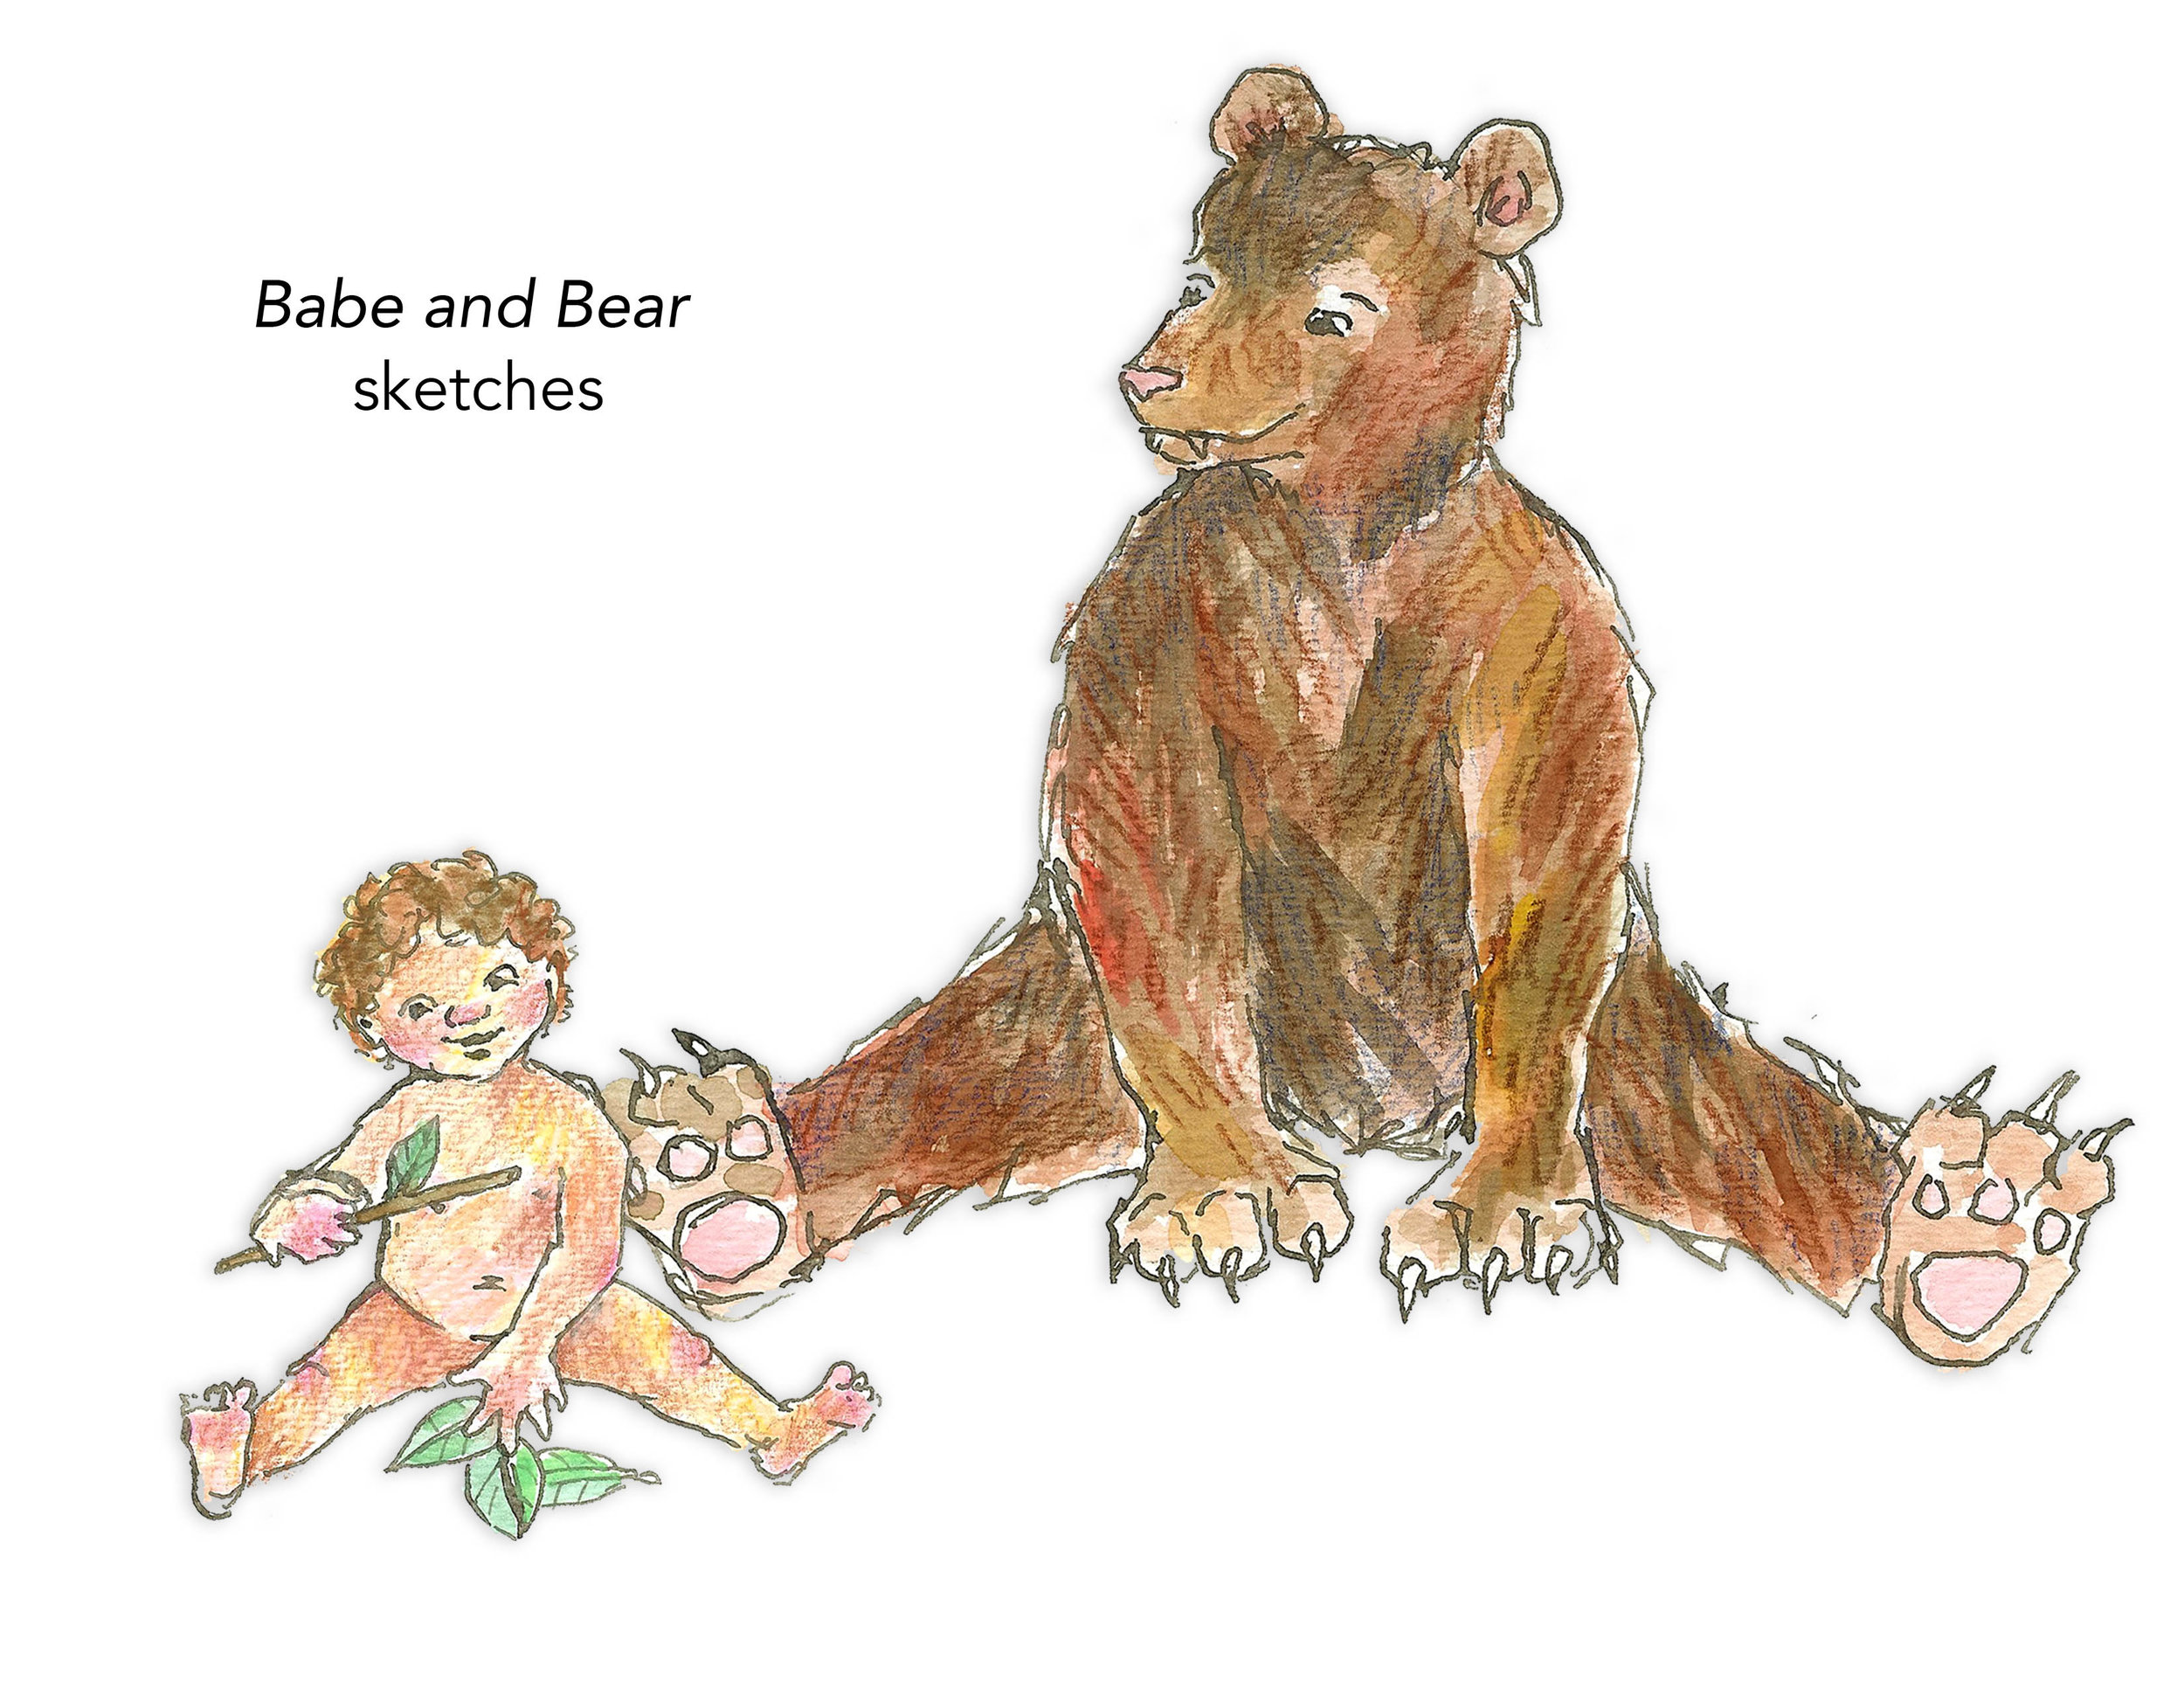 babe and bear 1.jpg